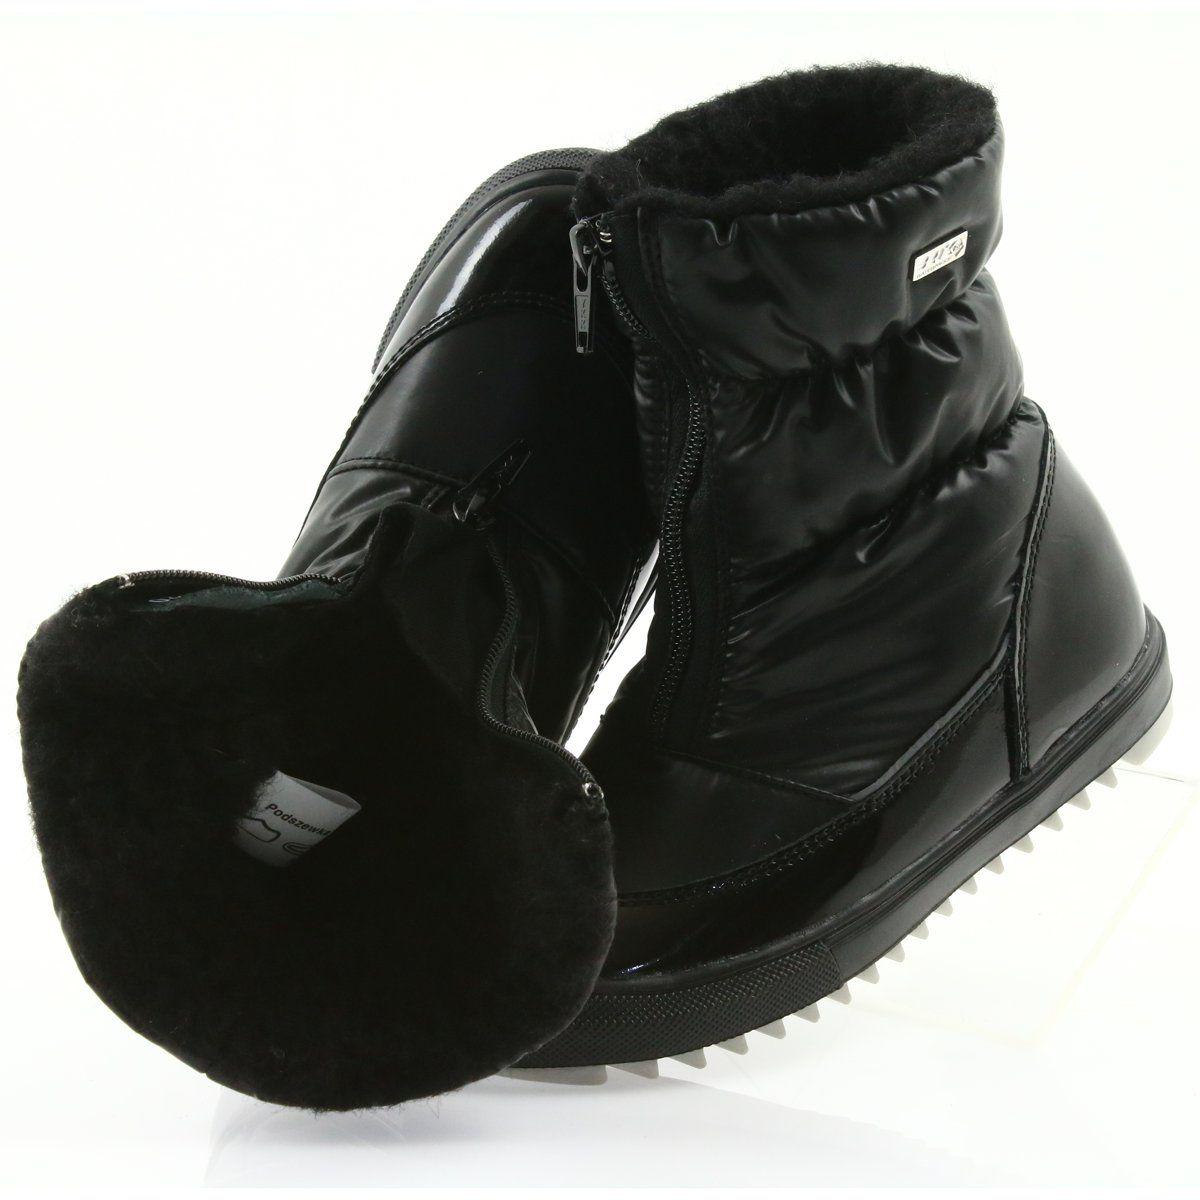 Kozaczki Z Membrana Bartek 47405 Czarne Boots Winter Boot Shoes